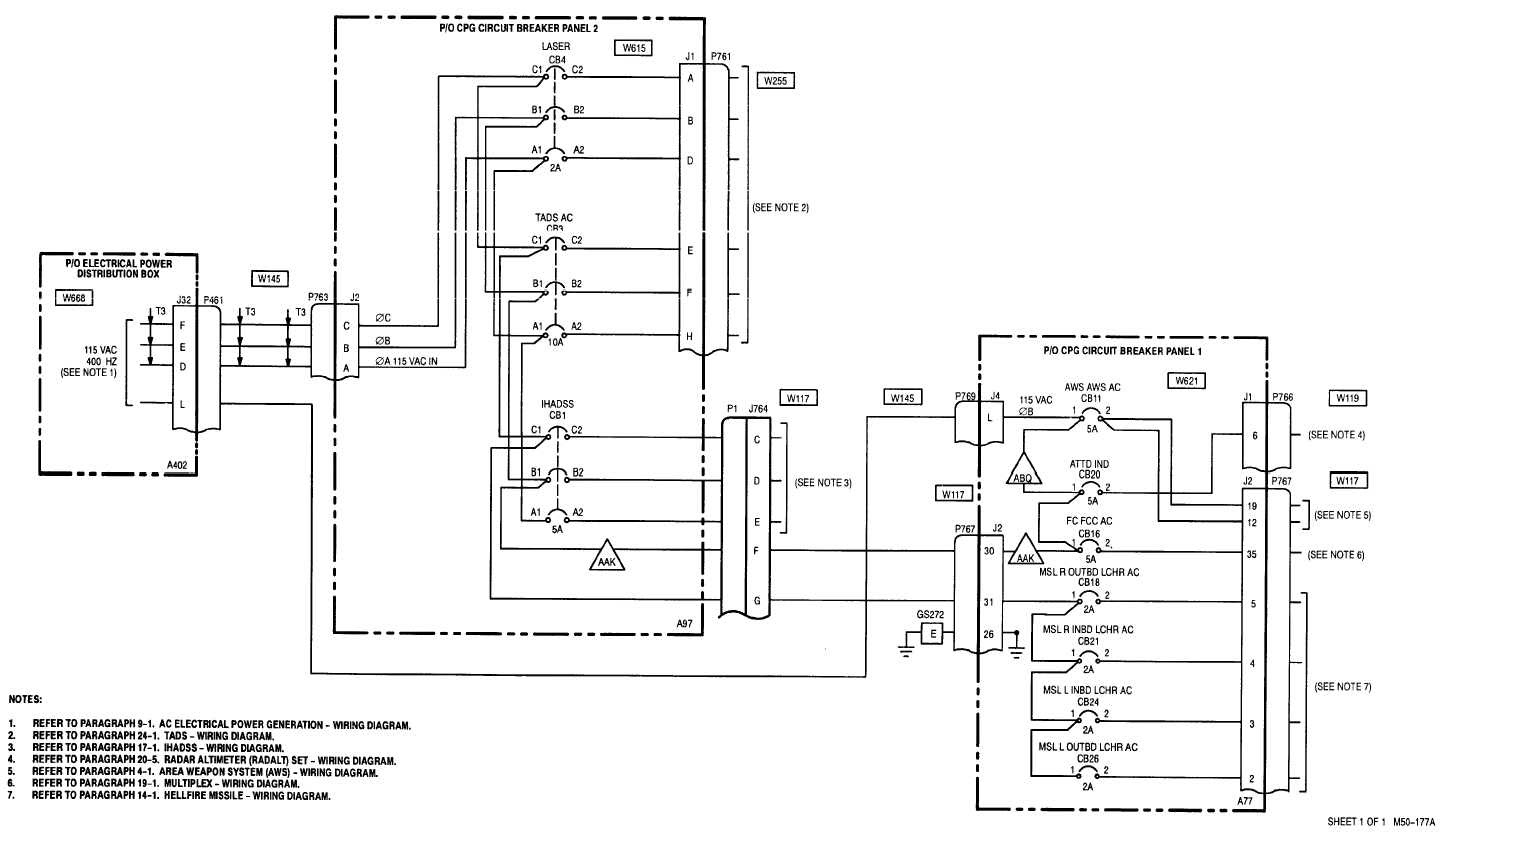 house ac wiring diagram